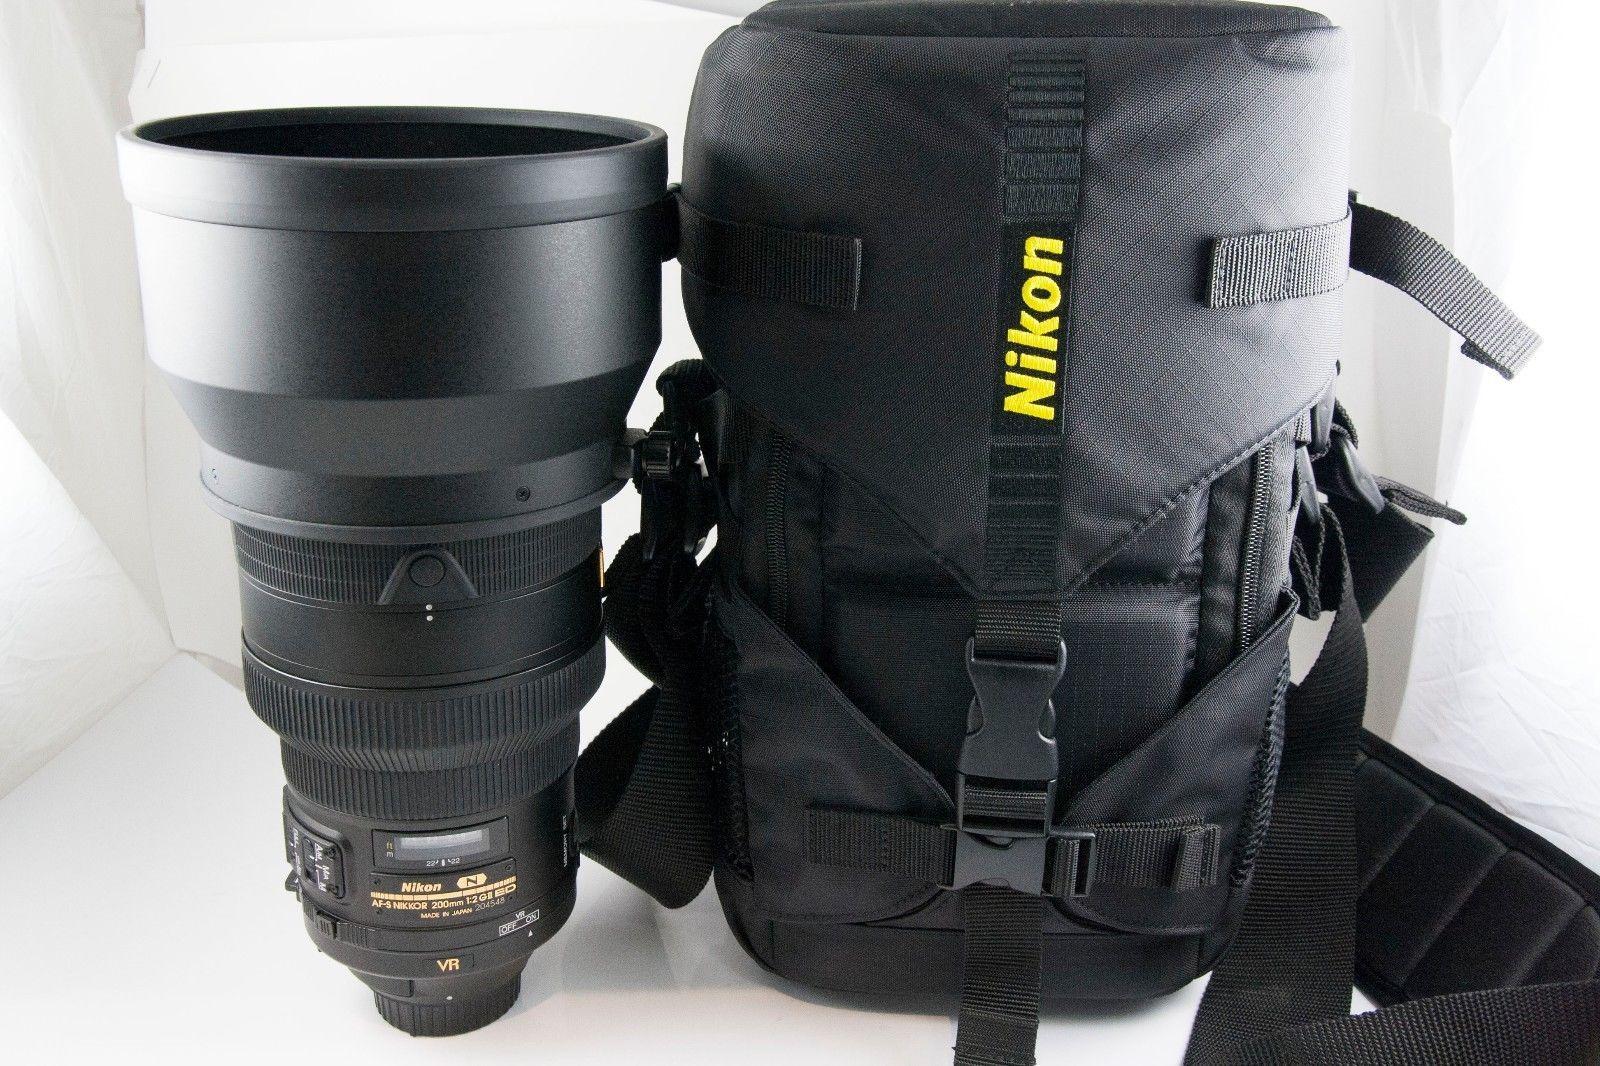 Nikon Af S Nikkor 200mm F 2 G Ed N Vr Ii Lens Mint Stuff To Buy Nikon Lens